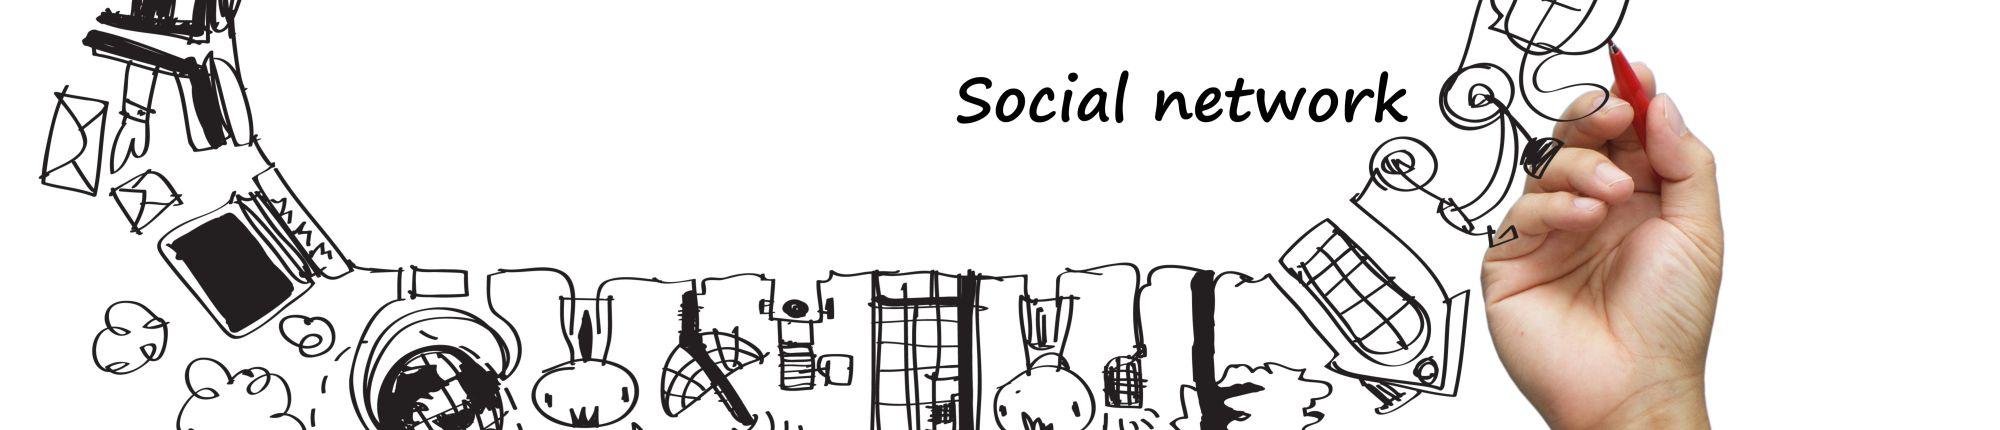 Digital services